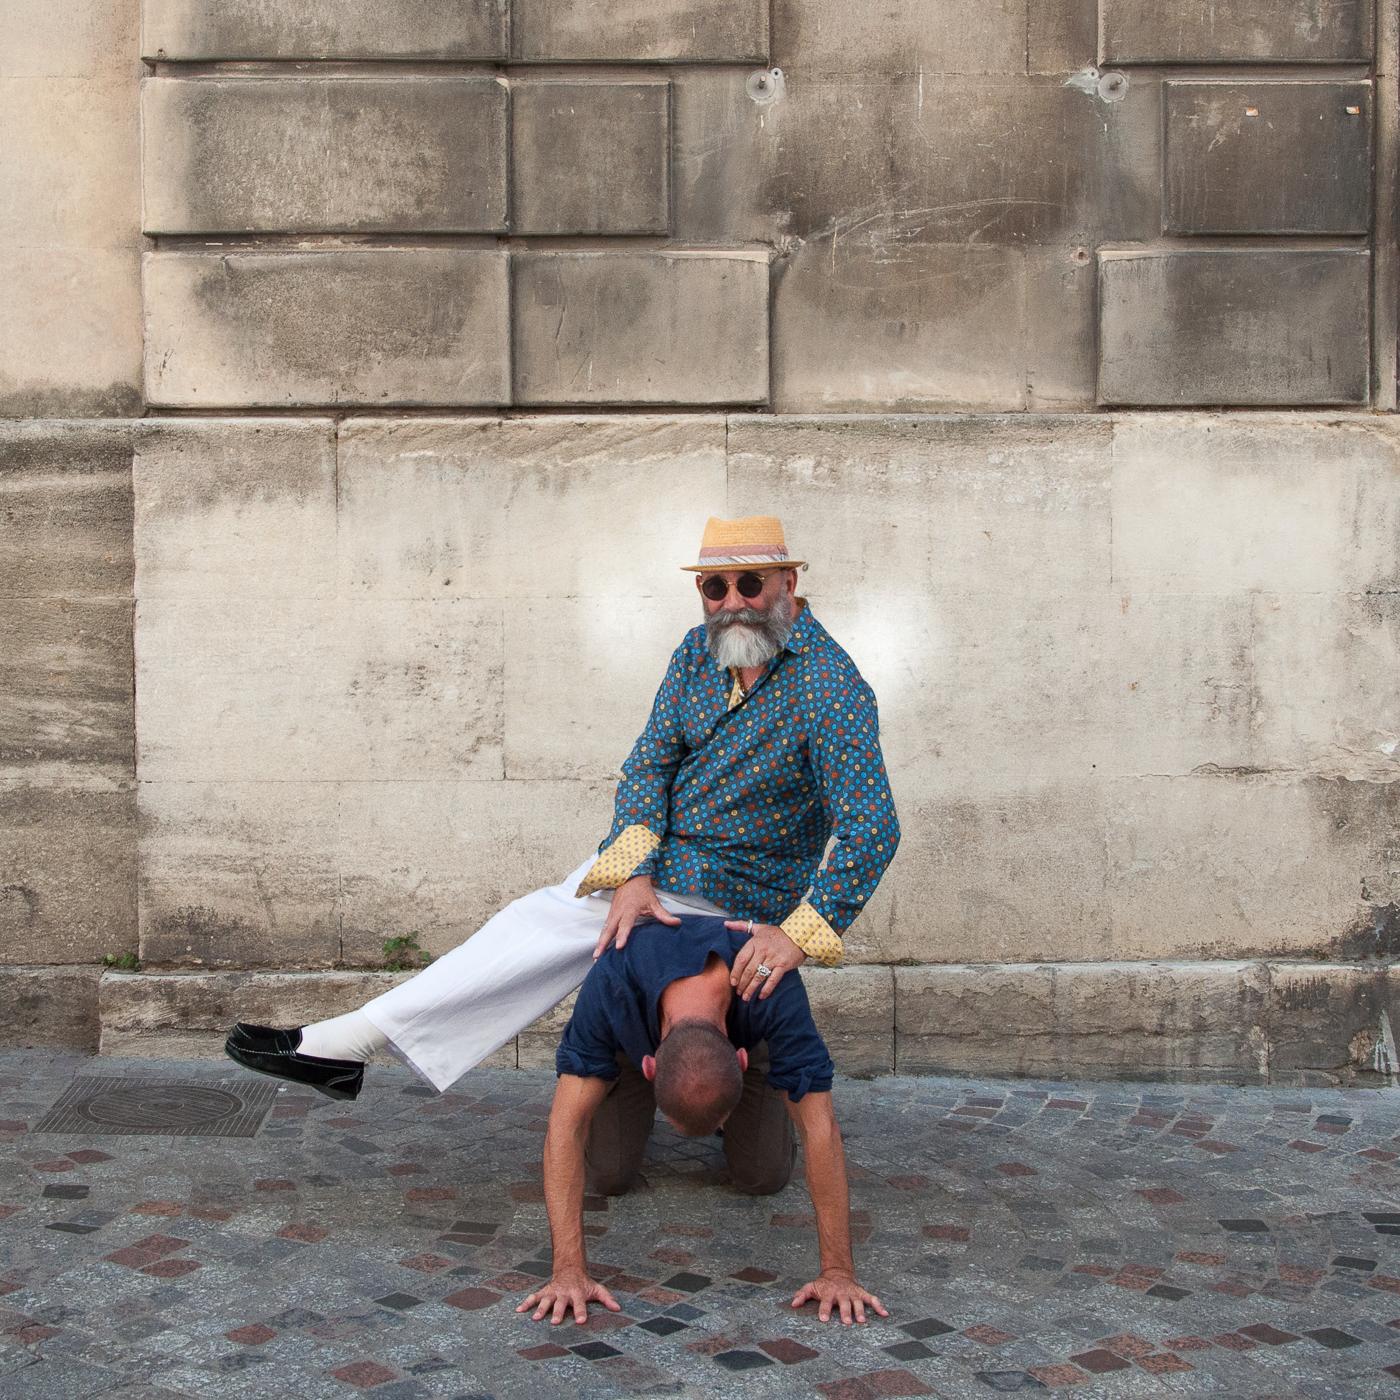 Arles 2015 - Amazone avec barbe